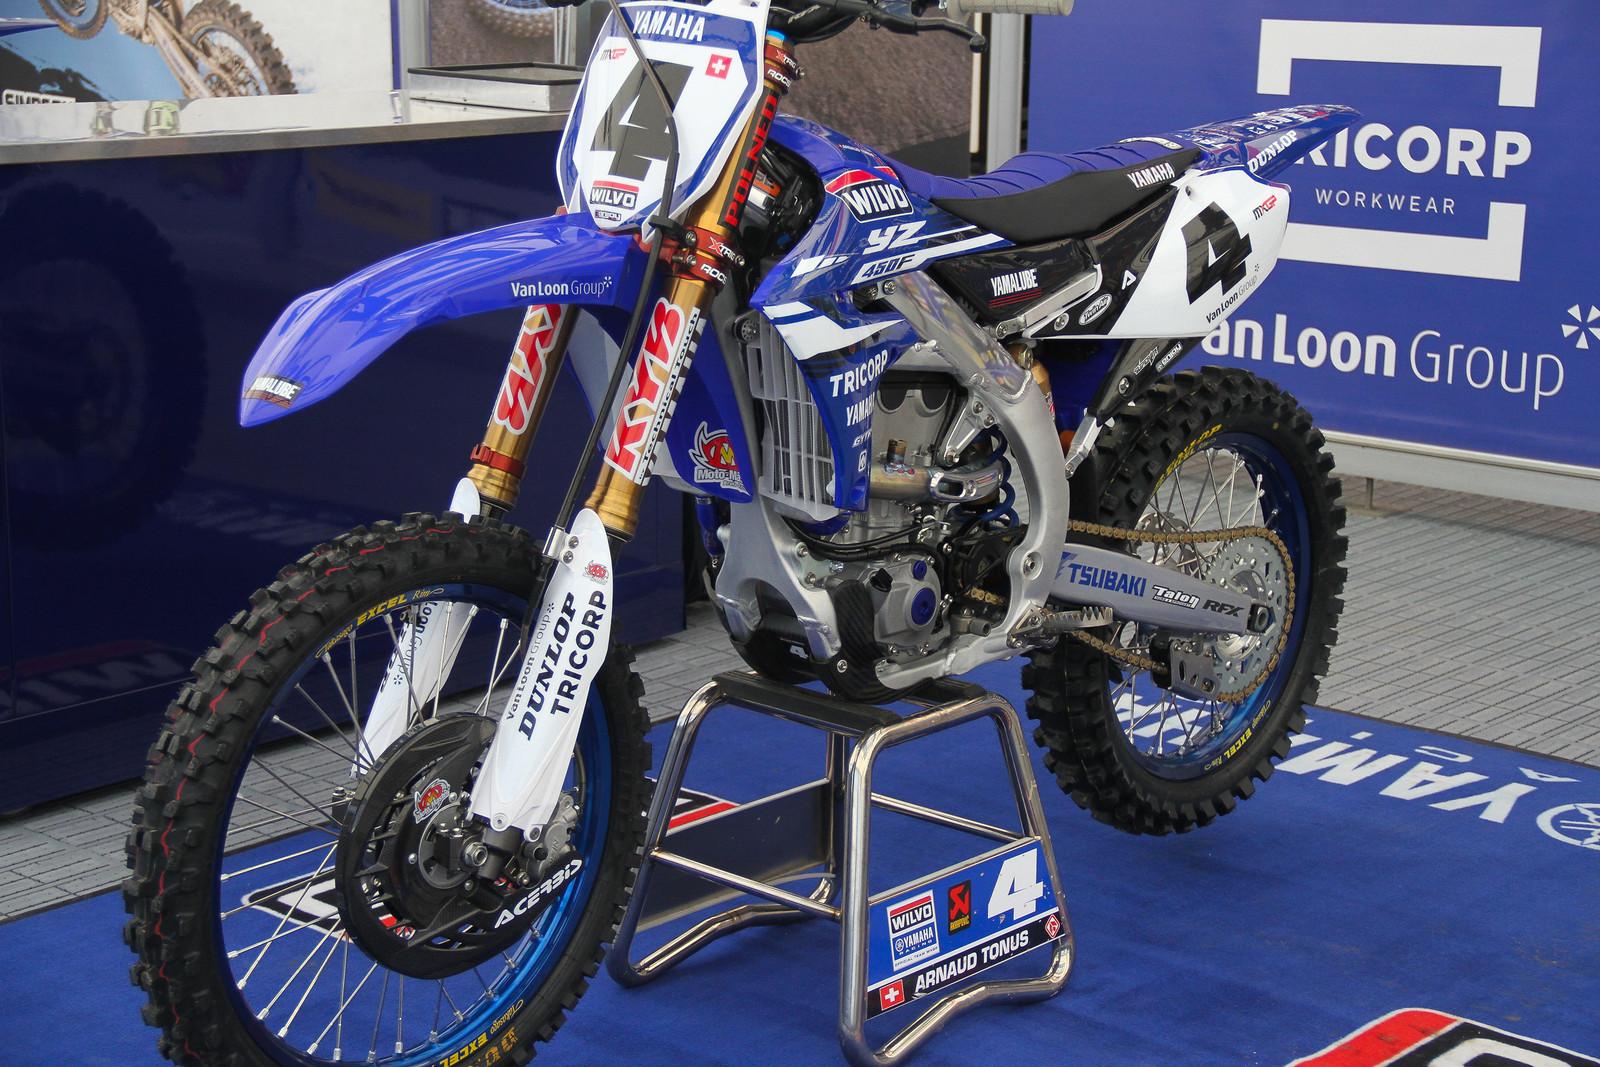 Arnaud Tonus 2018 WILVO Yamaha YZ450F - ayearinmx - Motocross Pictures - Vital MX